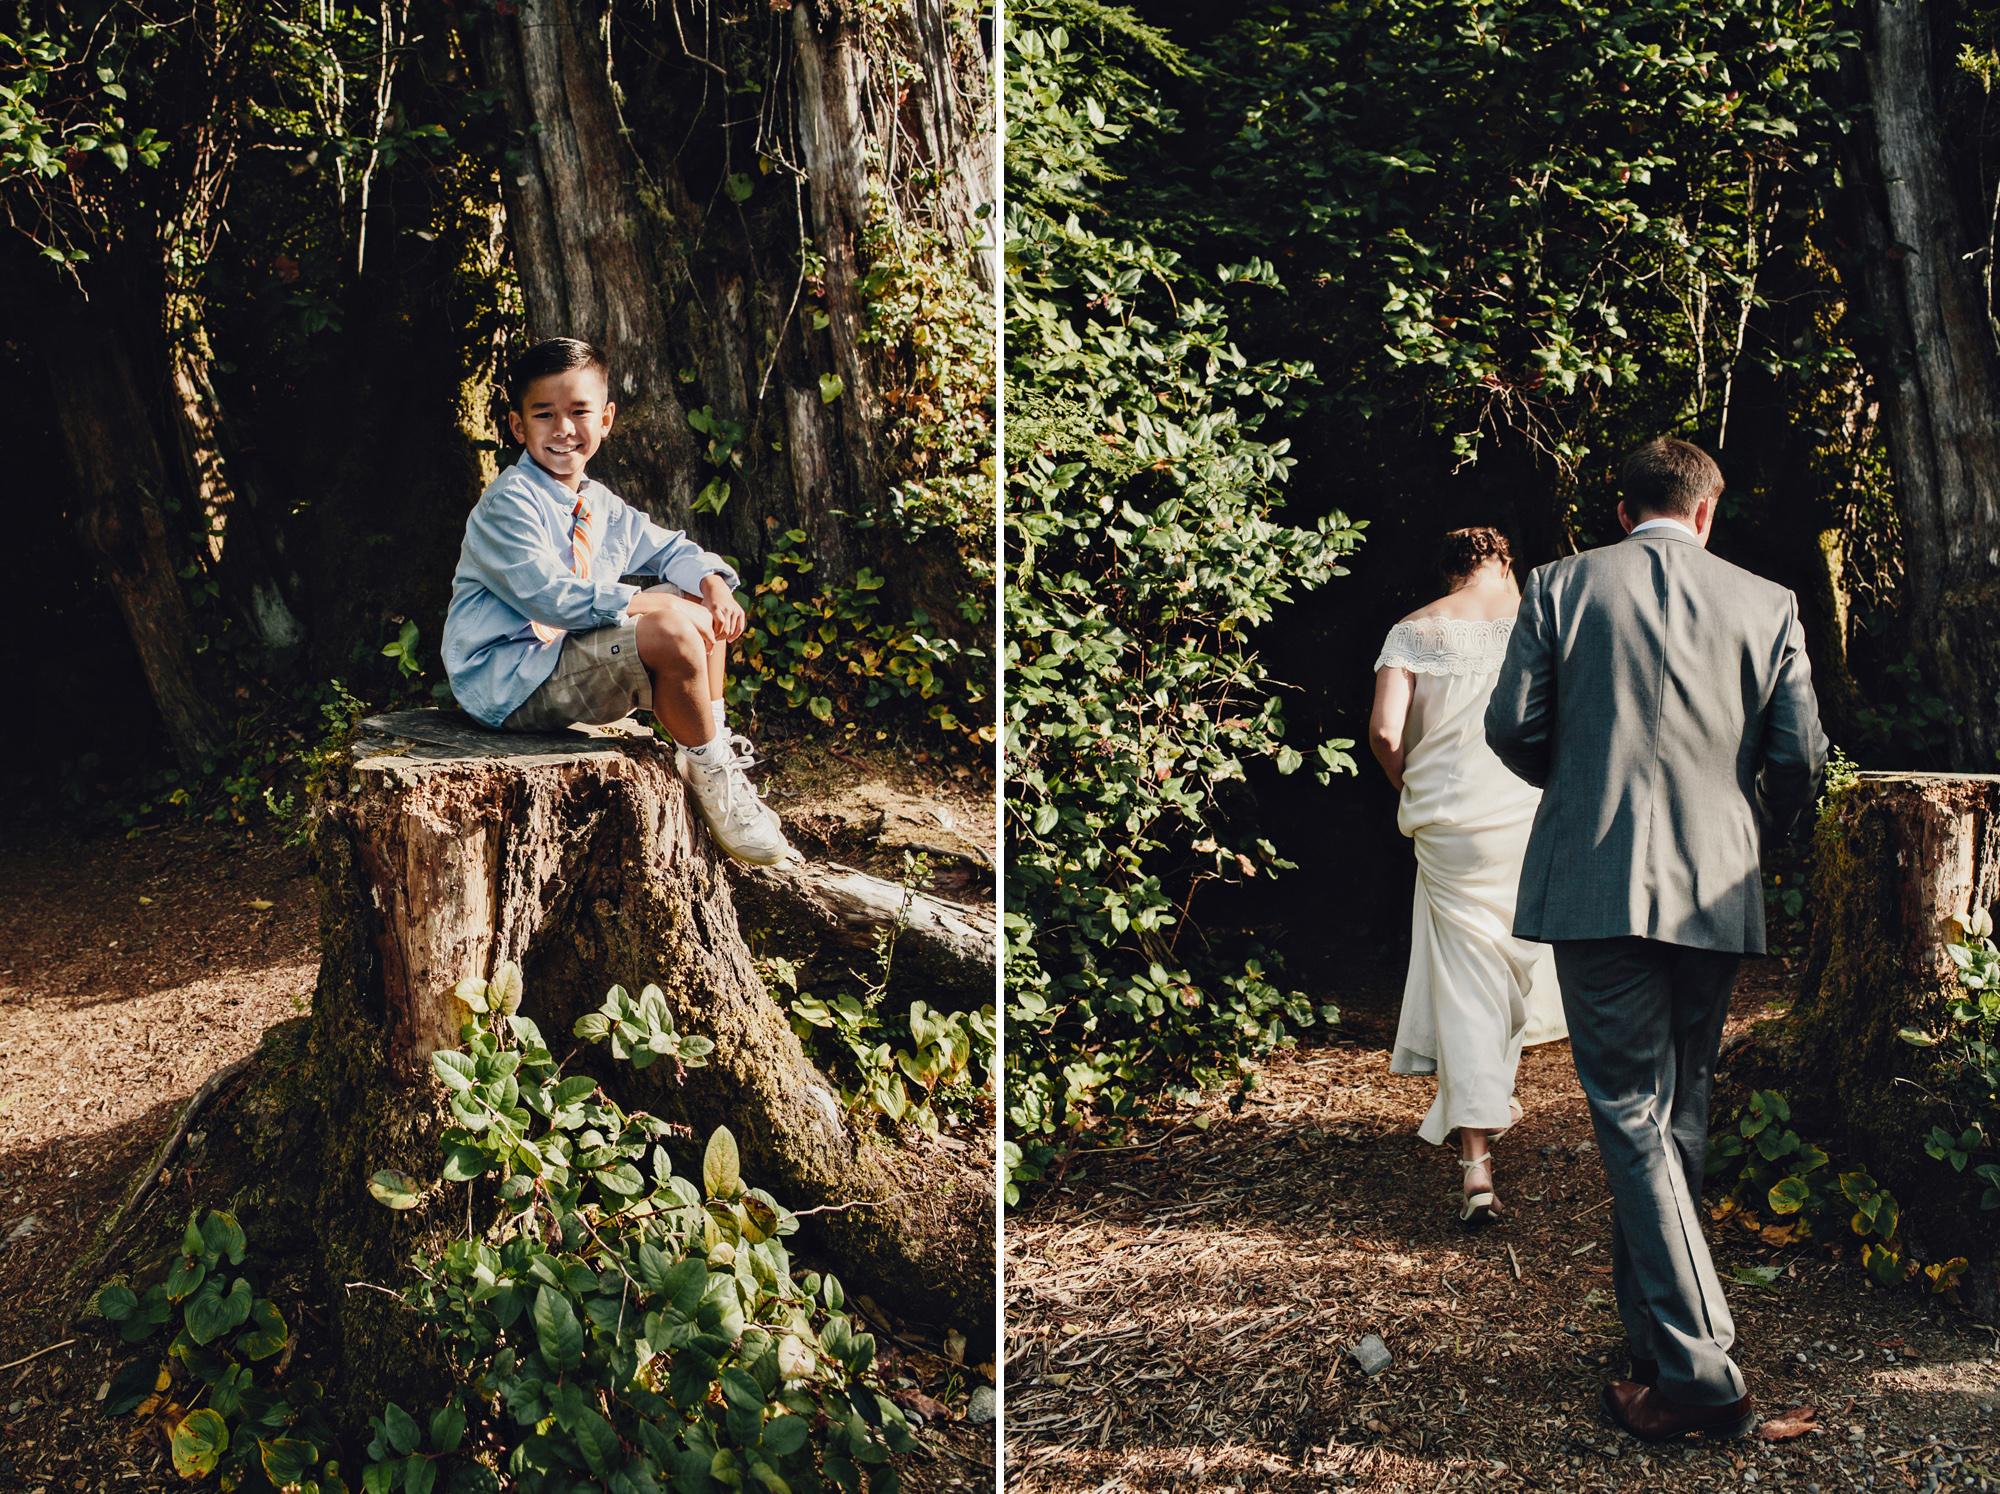 Tofino-Botanical-Gardens-Wedding-Photos-0097.jpg